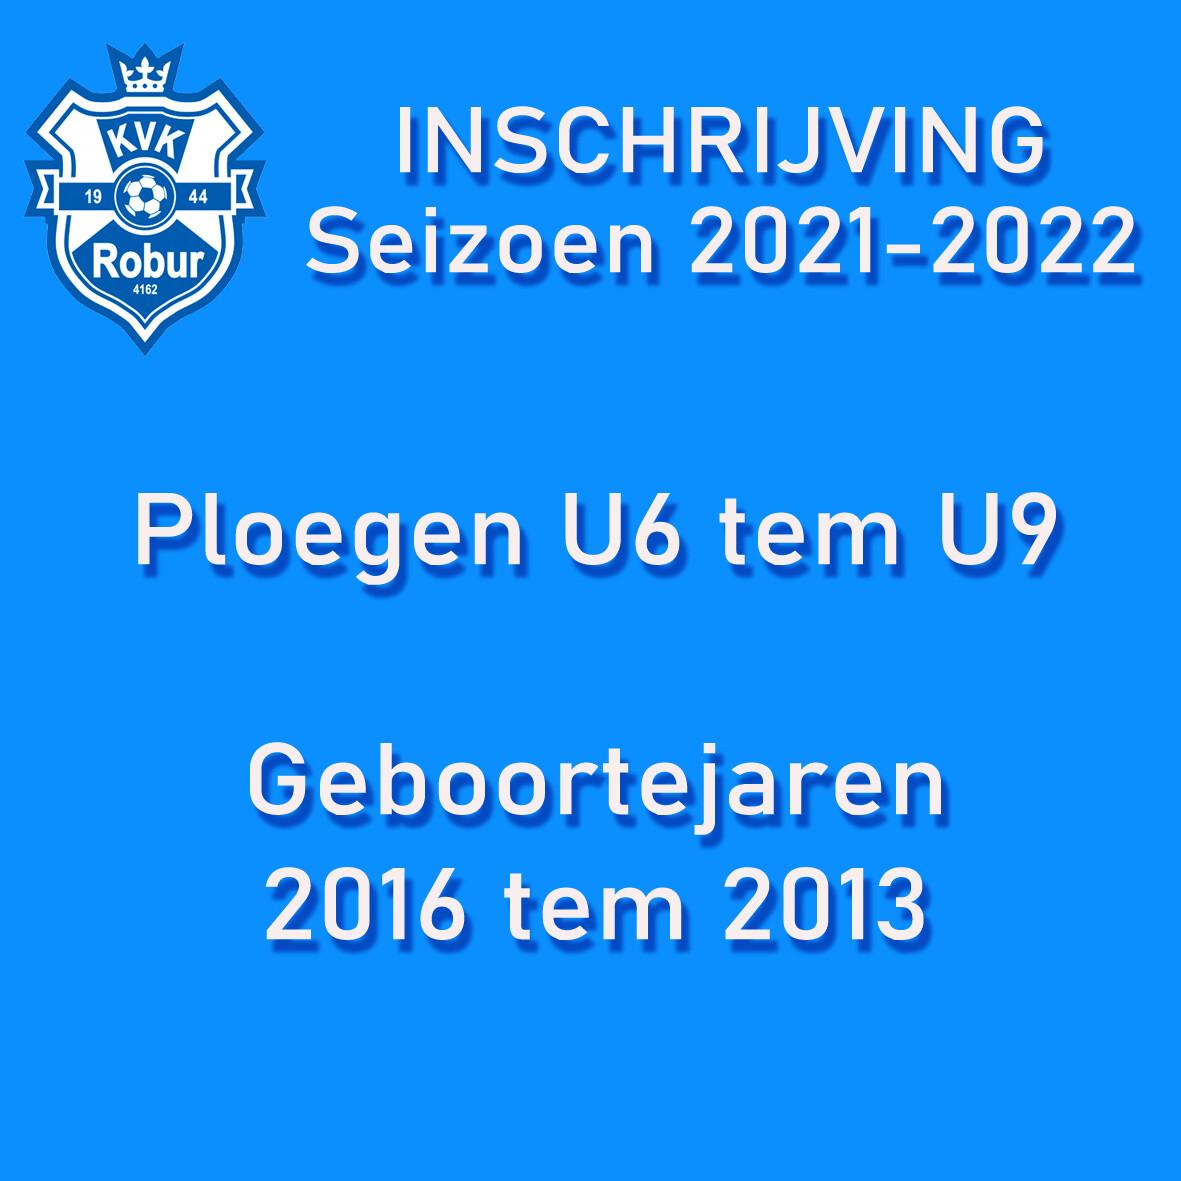 Inschrijving Seizoen 2021 - 2022 U6 tem U9